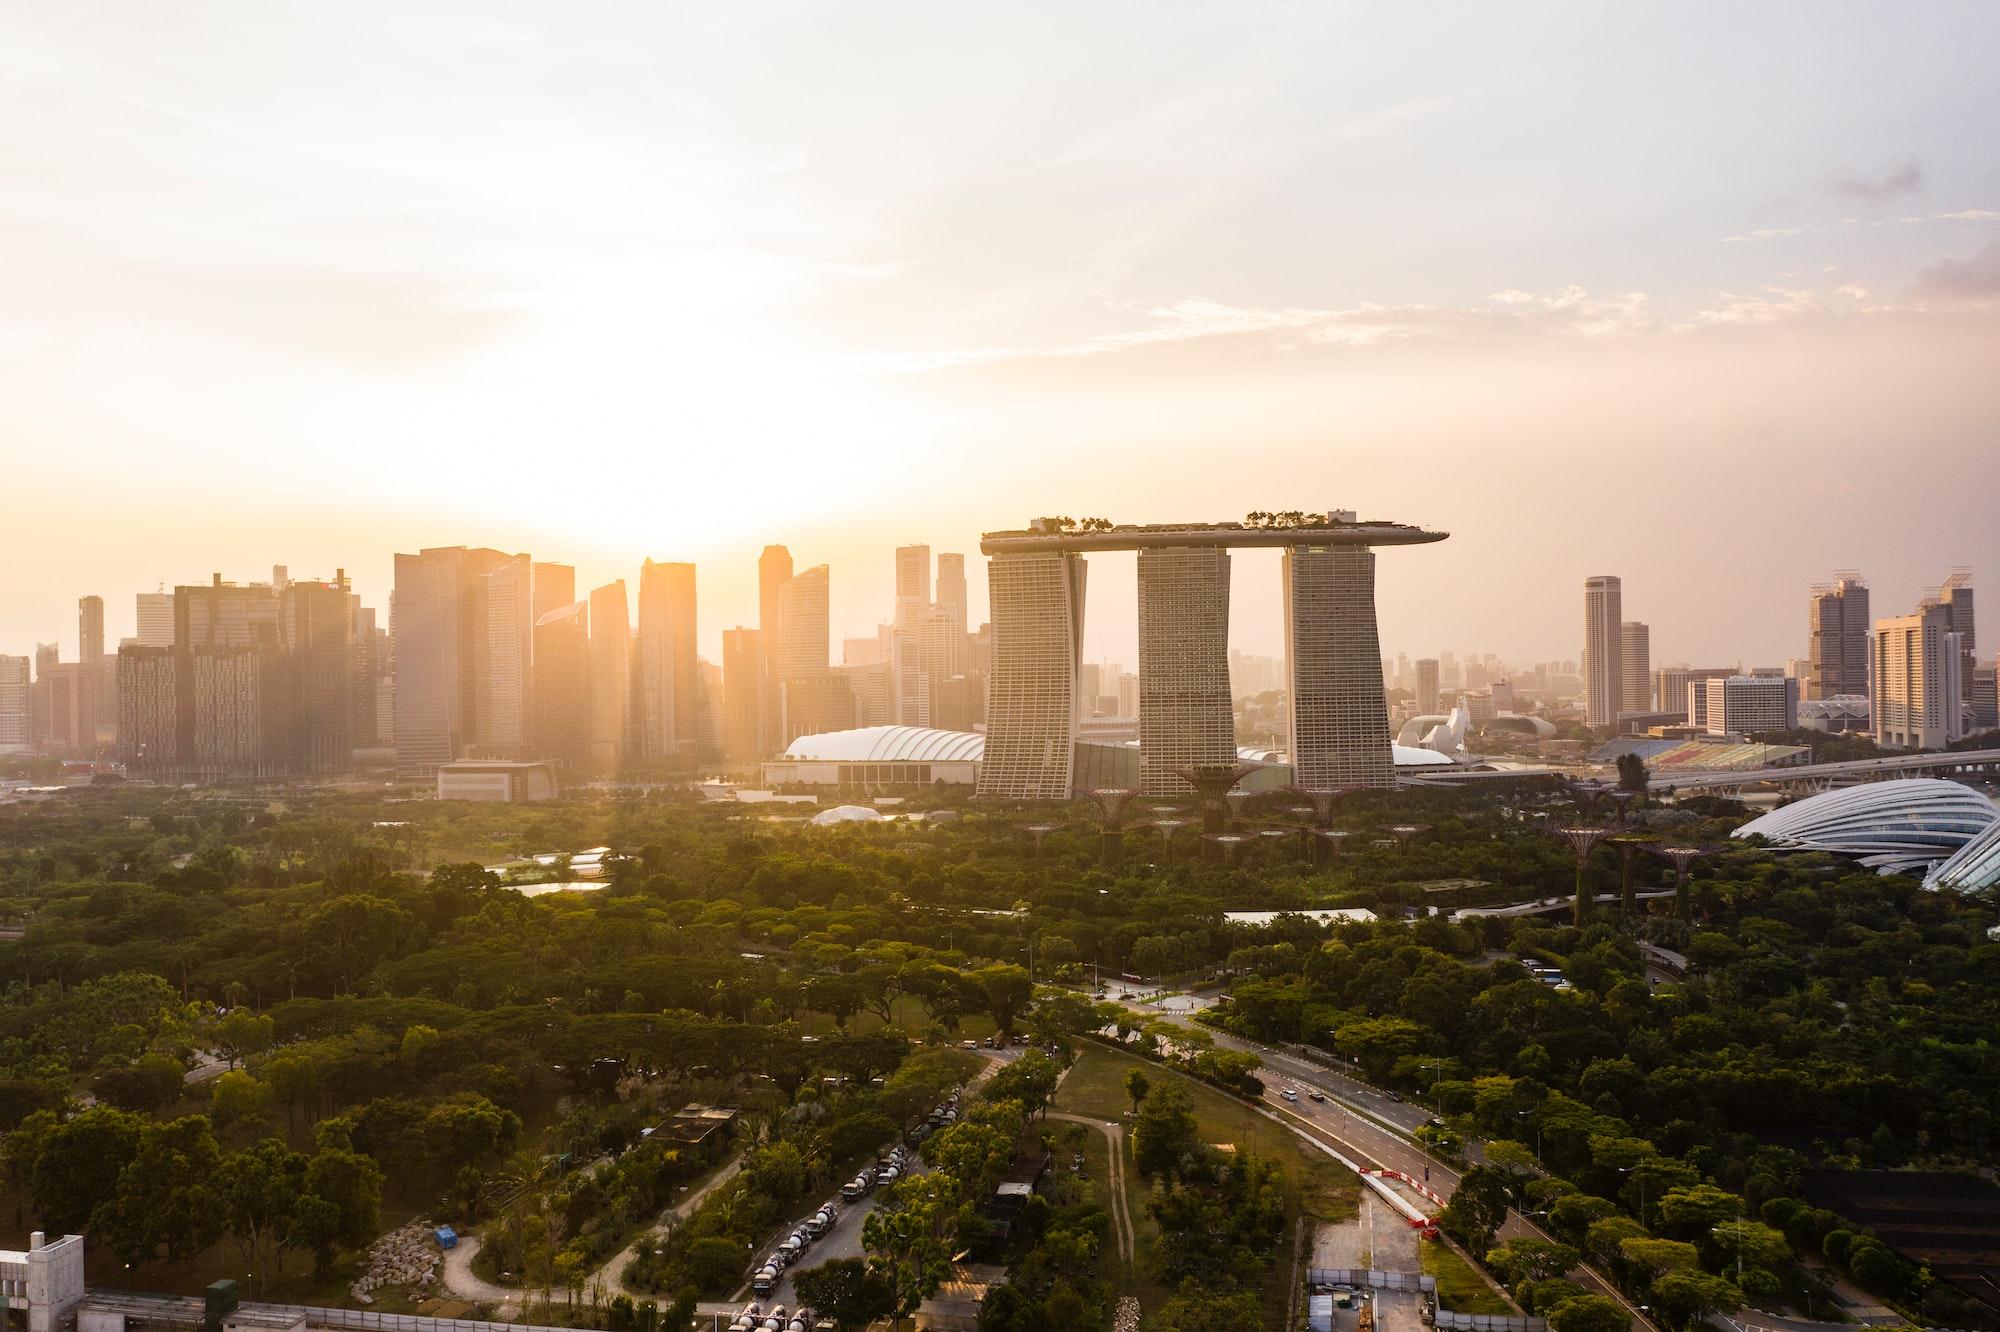 Singapore: Semi-lockdown Situation